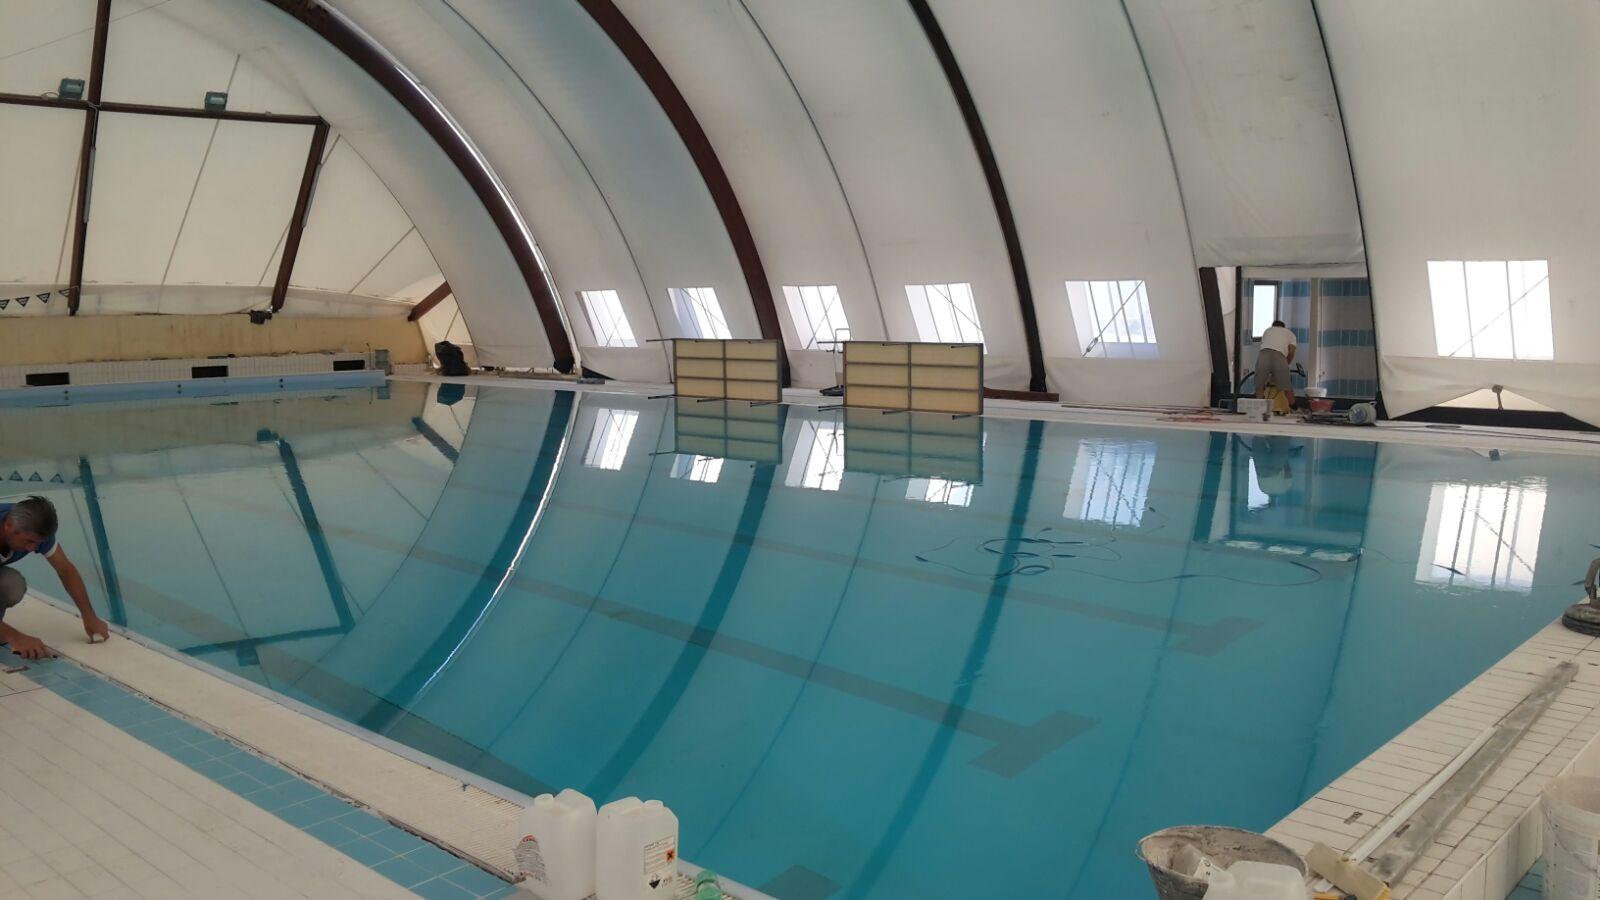 piscina esercito